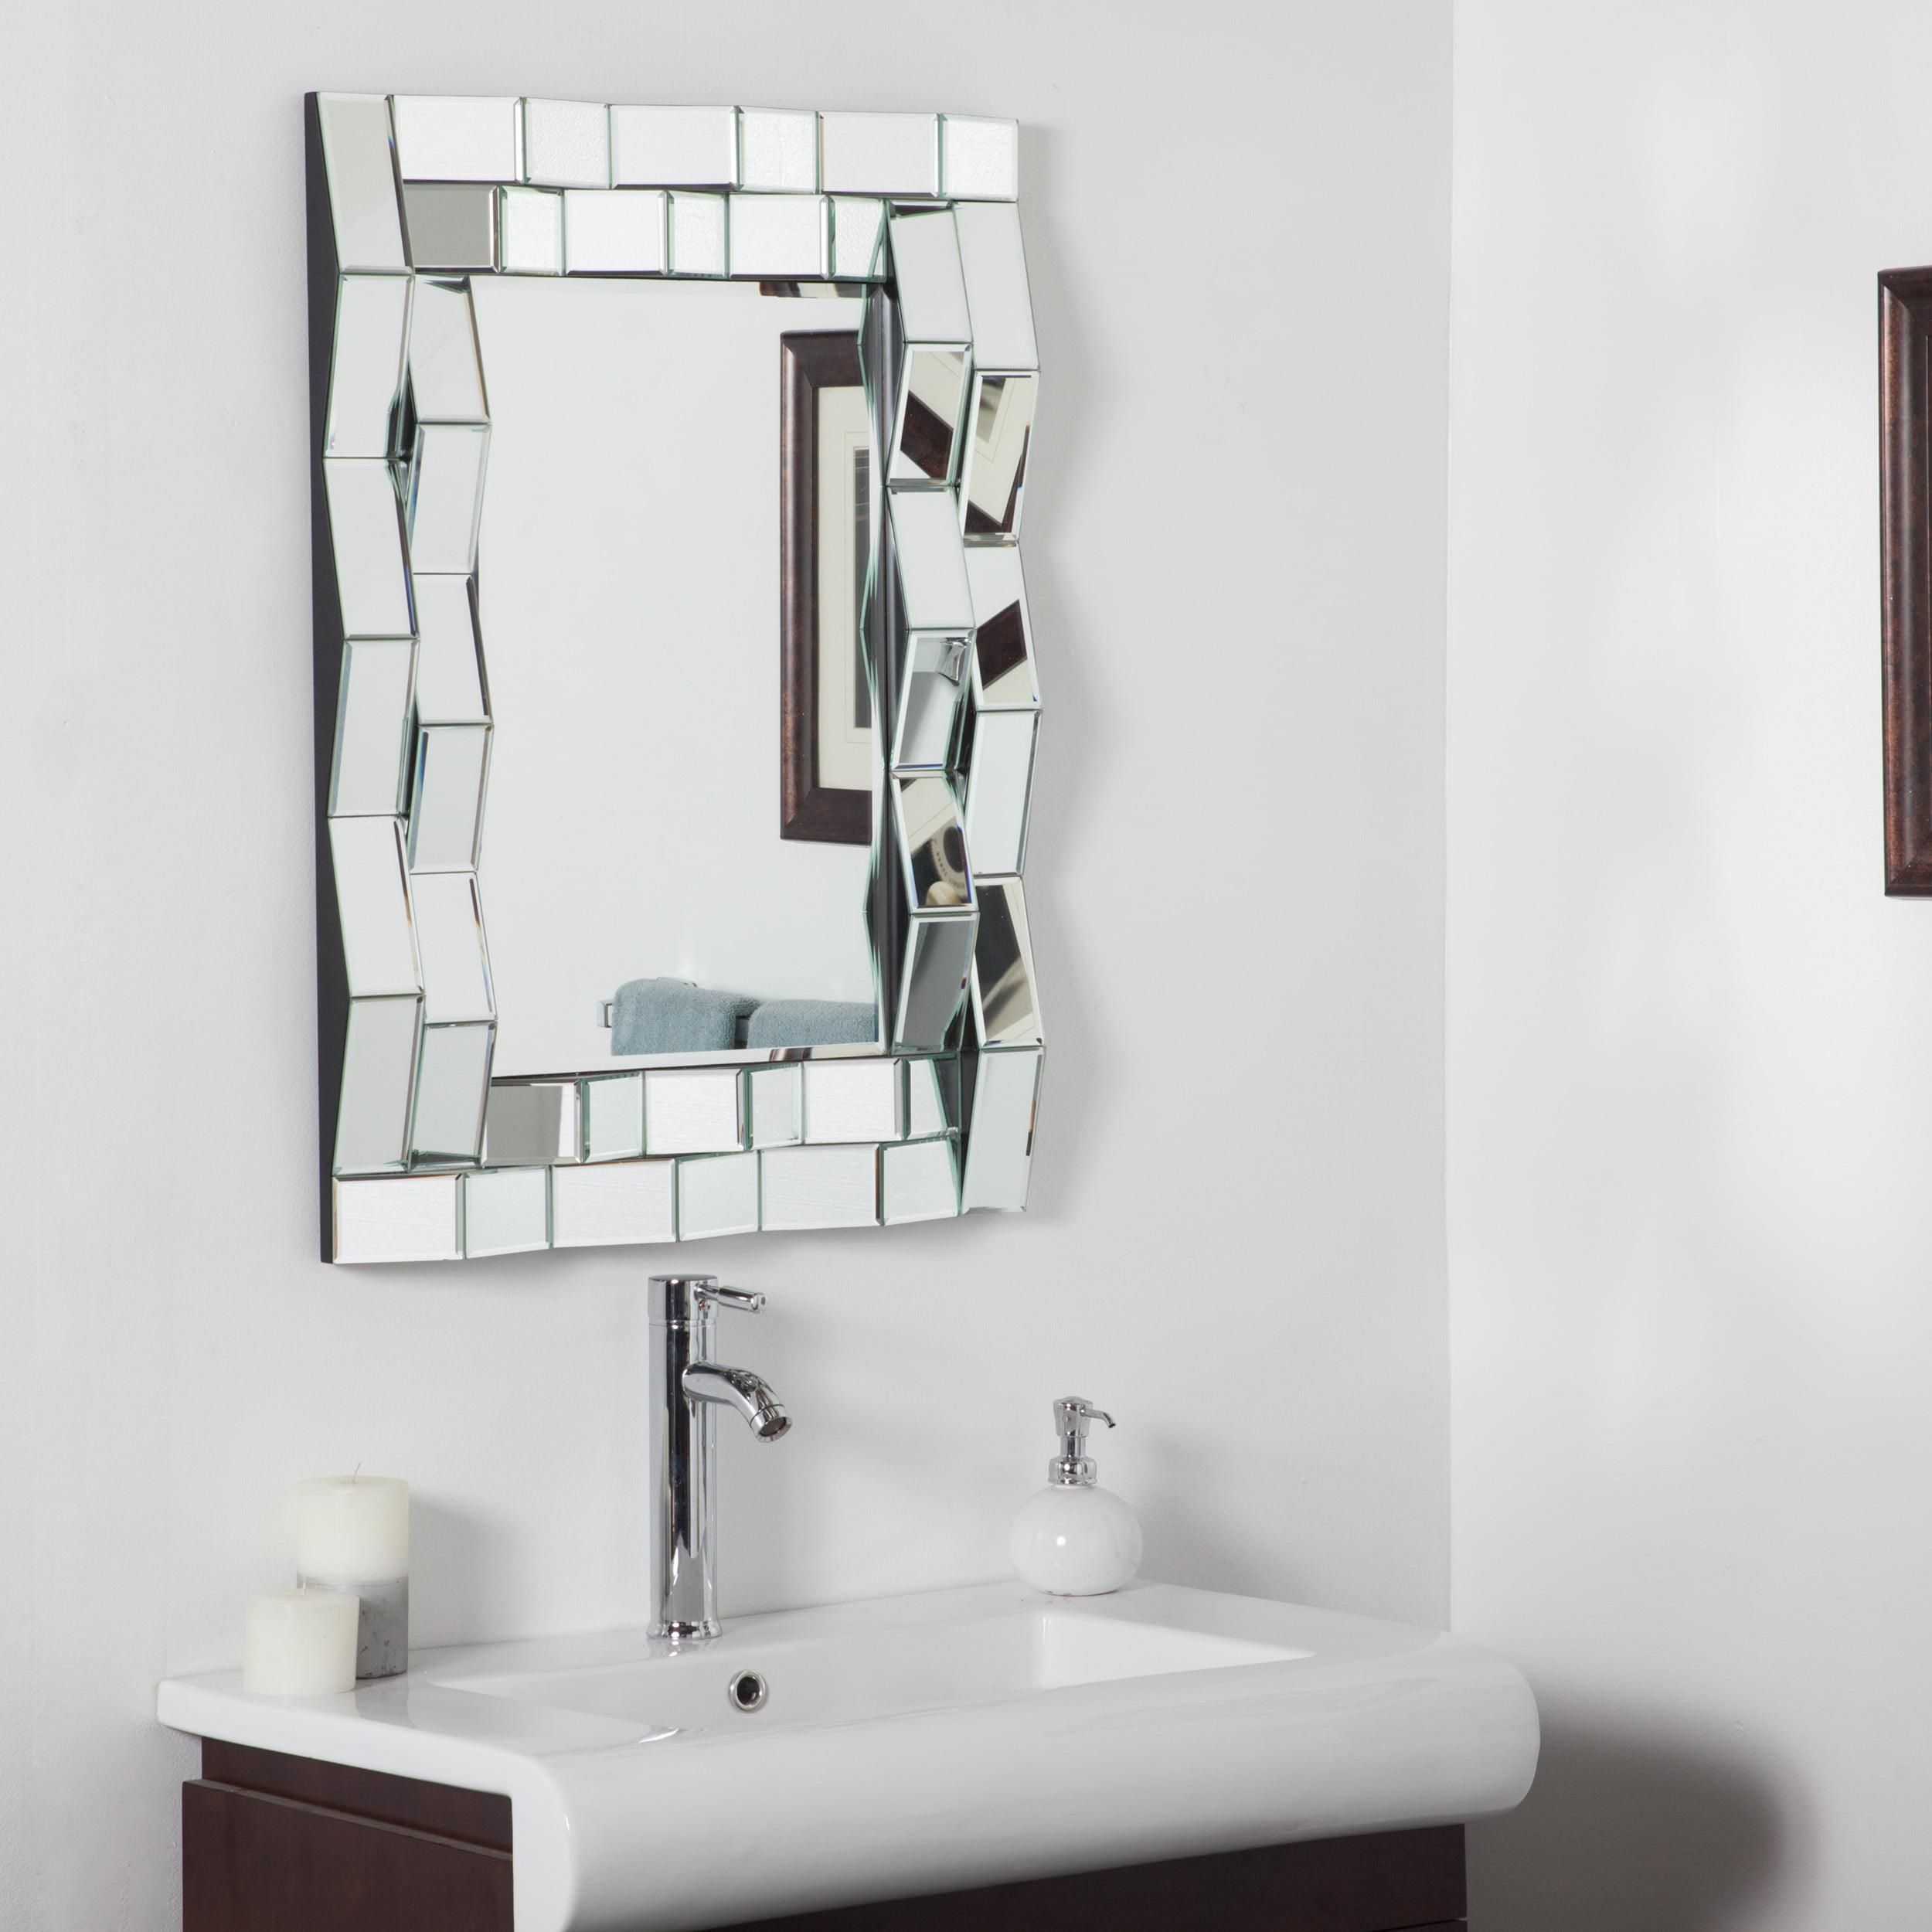 Iso modern bathroom mirror - Walmart.com